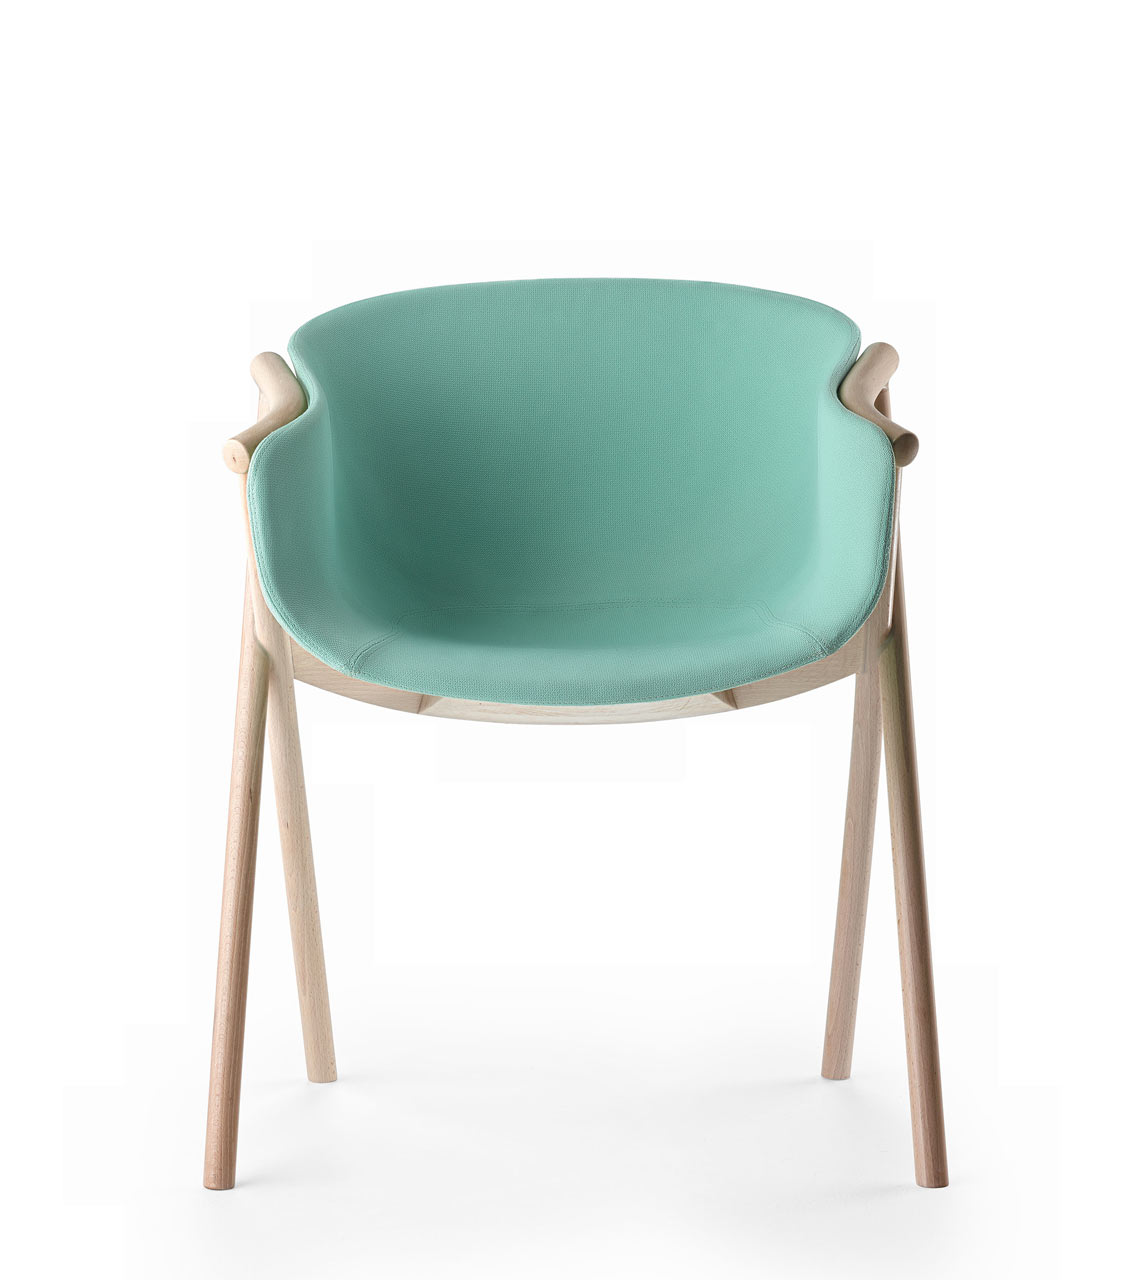 Bai-Chair-Ondarreta-Ander-Lizaso-3